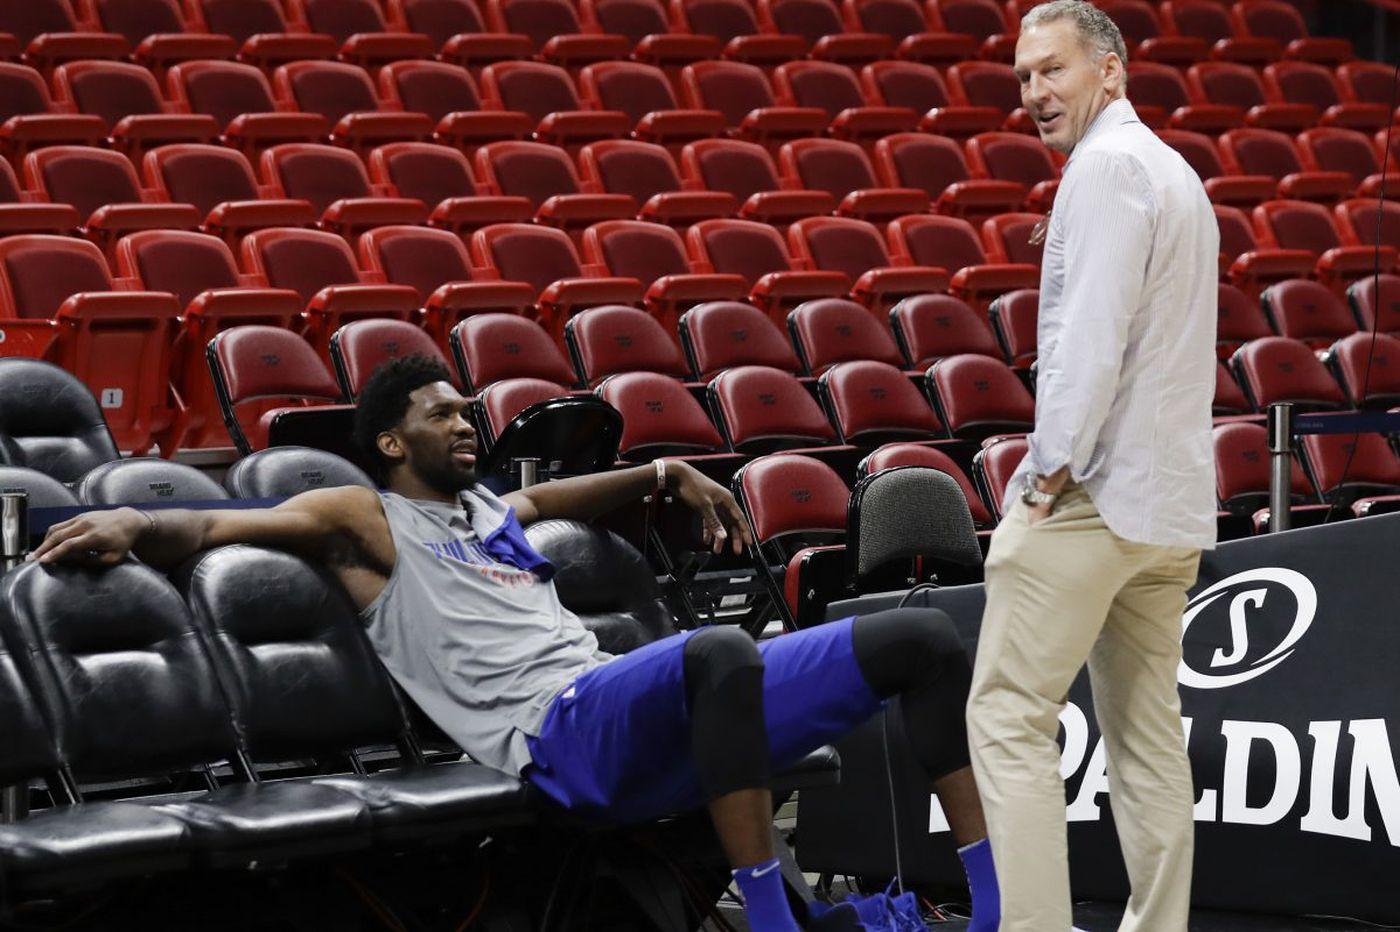 Bryan Colangelo social media reaction: Joel Embiid, NBA Twitter react to the Ringer's report